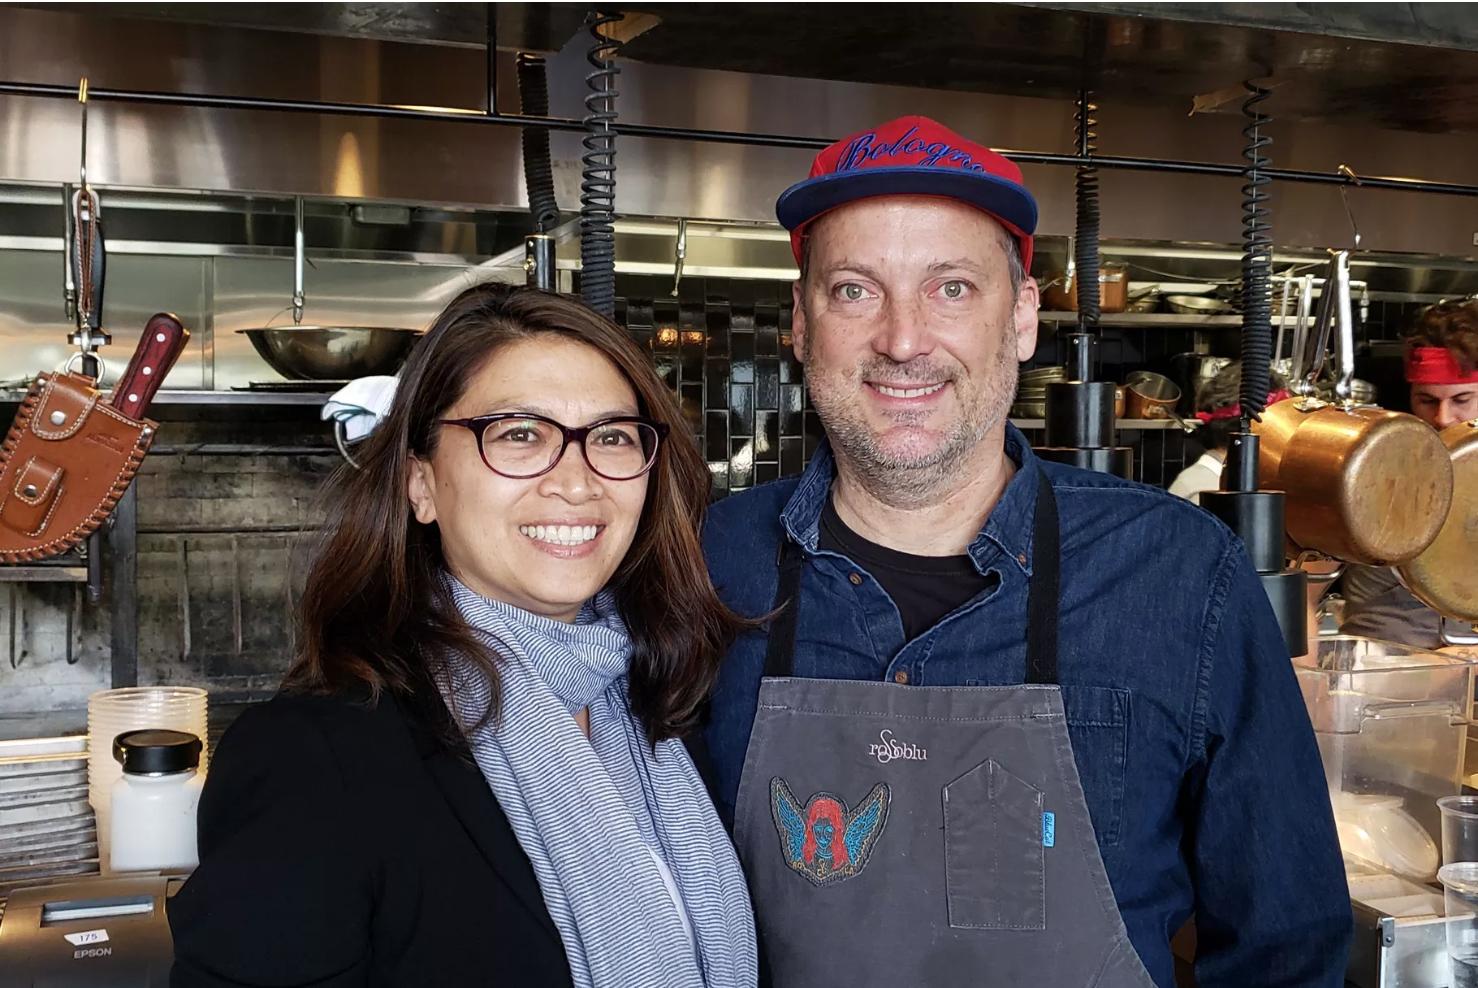 Steve and Dina Samson portrait Eater LA article